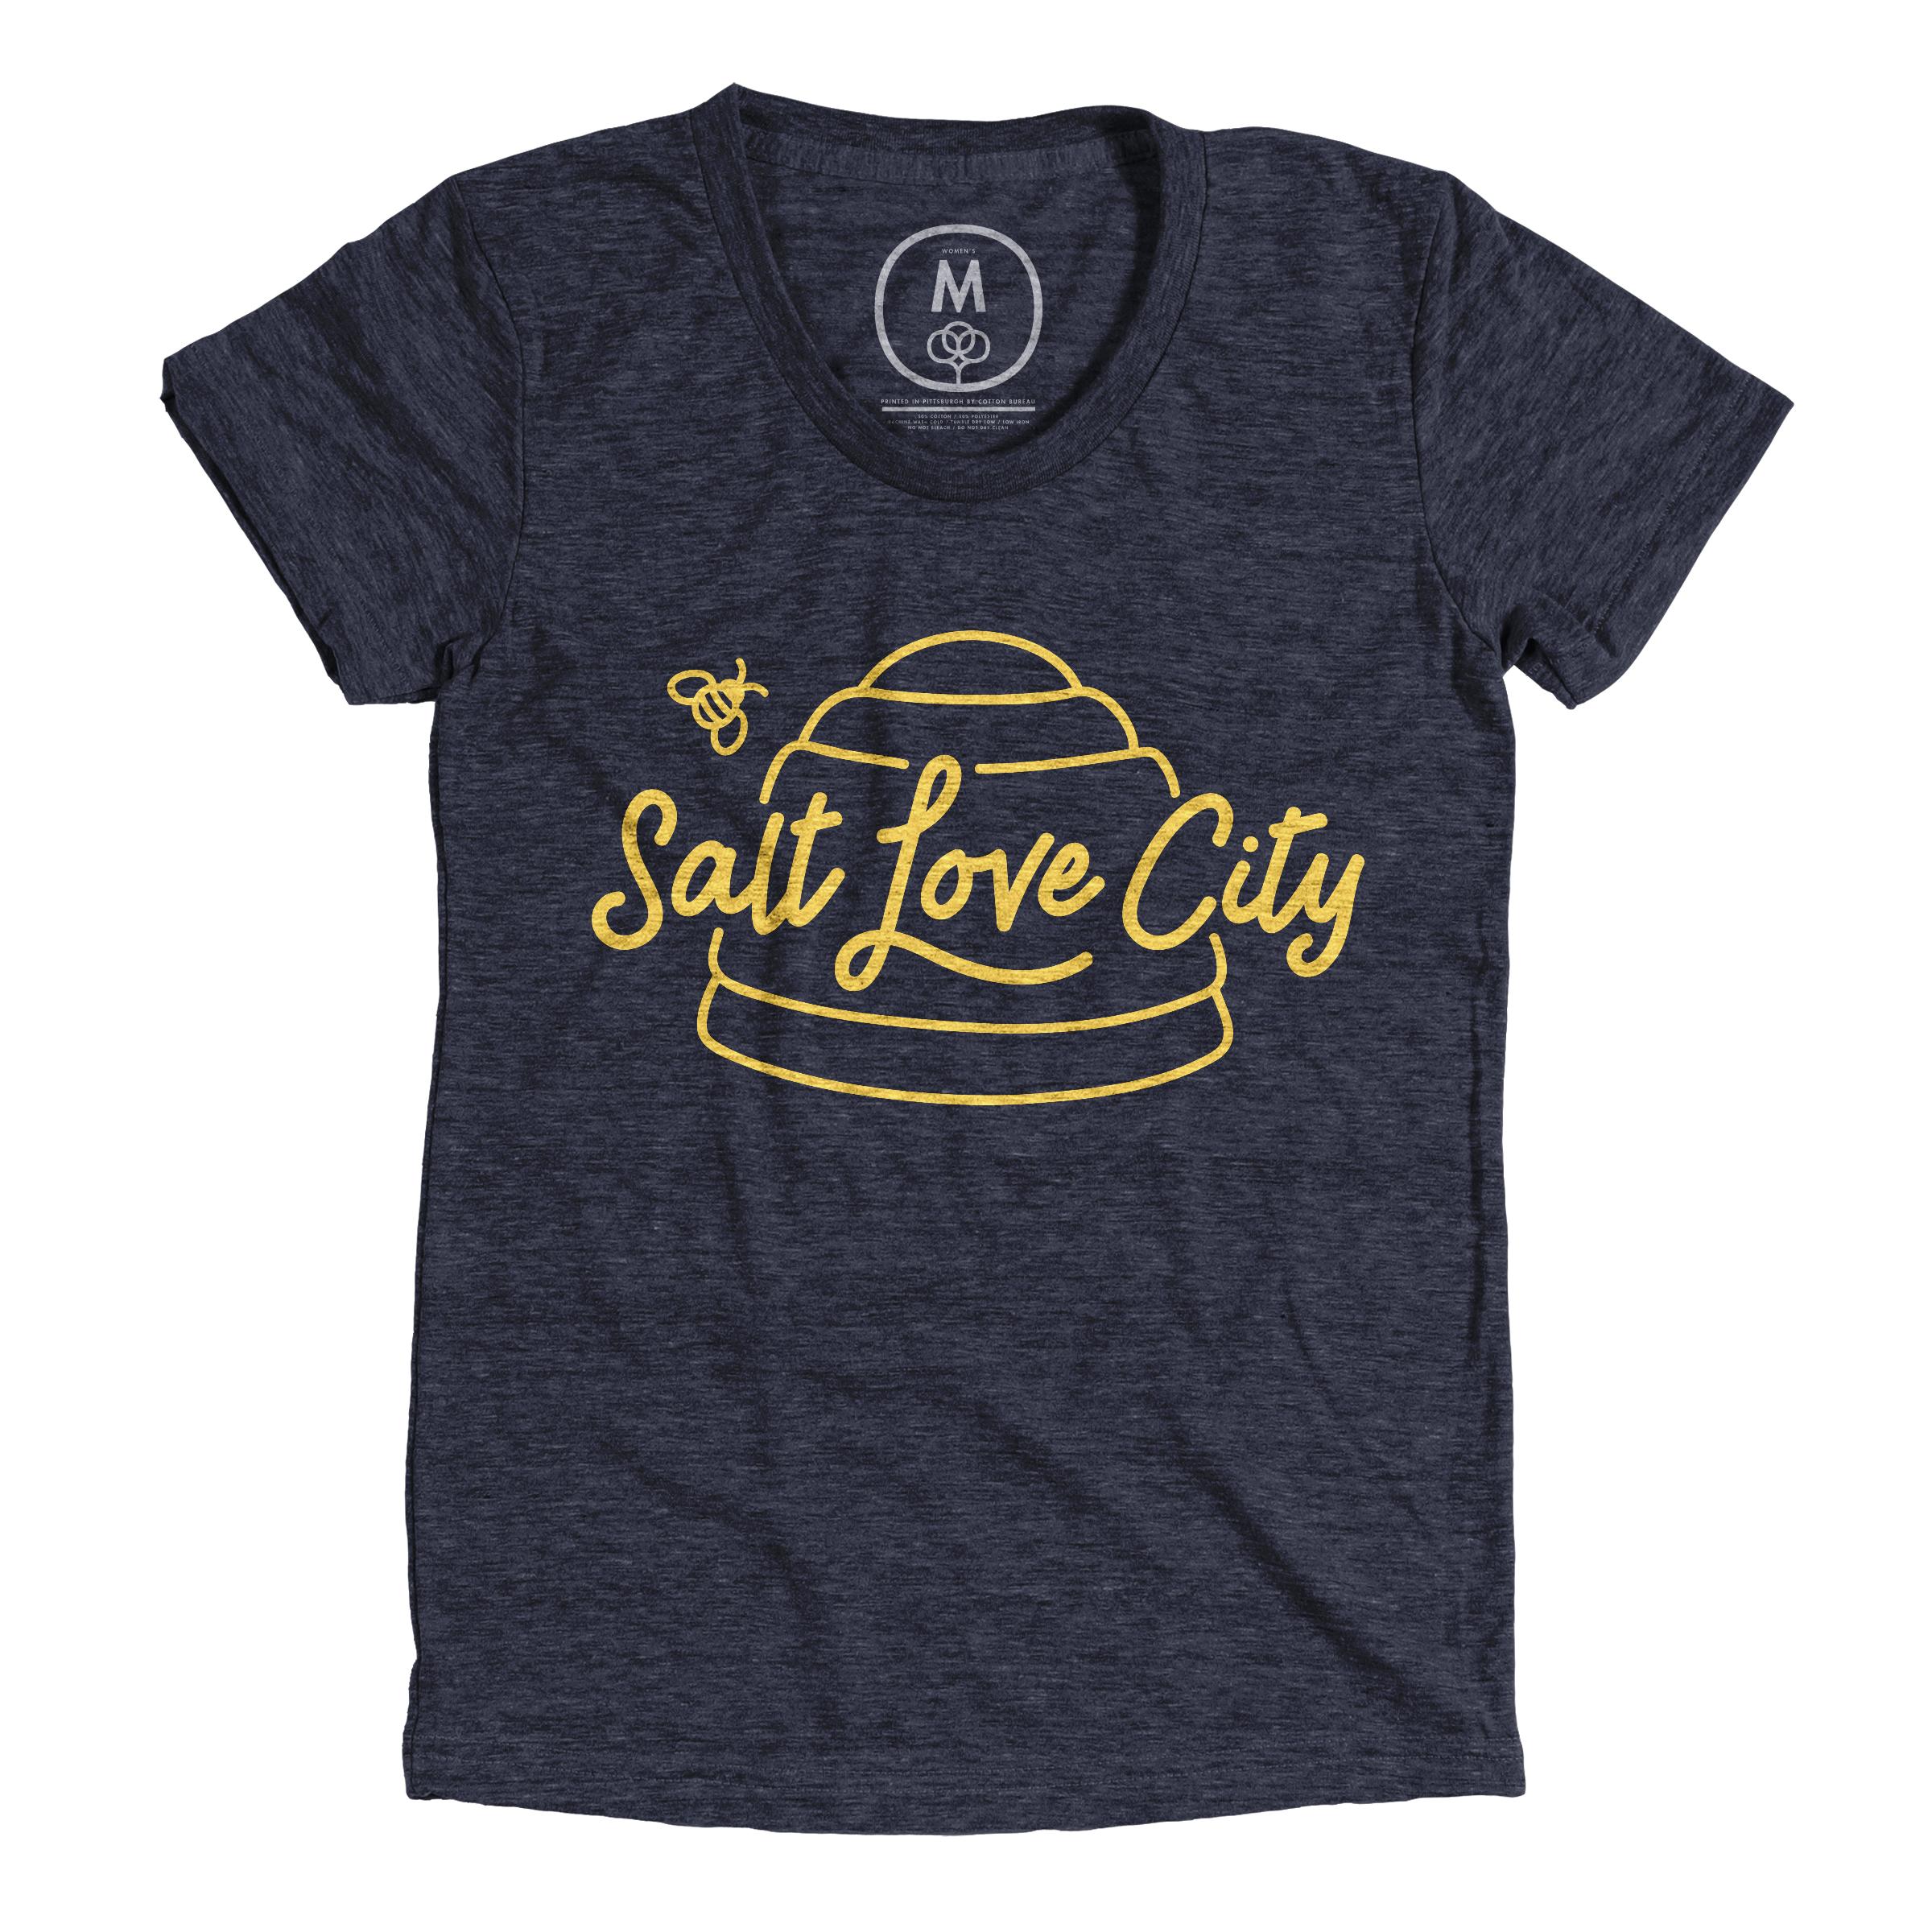 Salt Love City Vintage Navy (Women's)